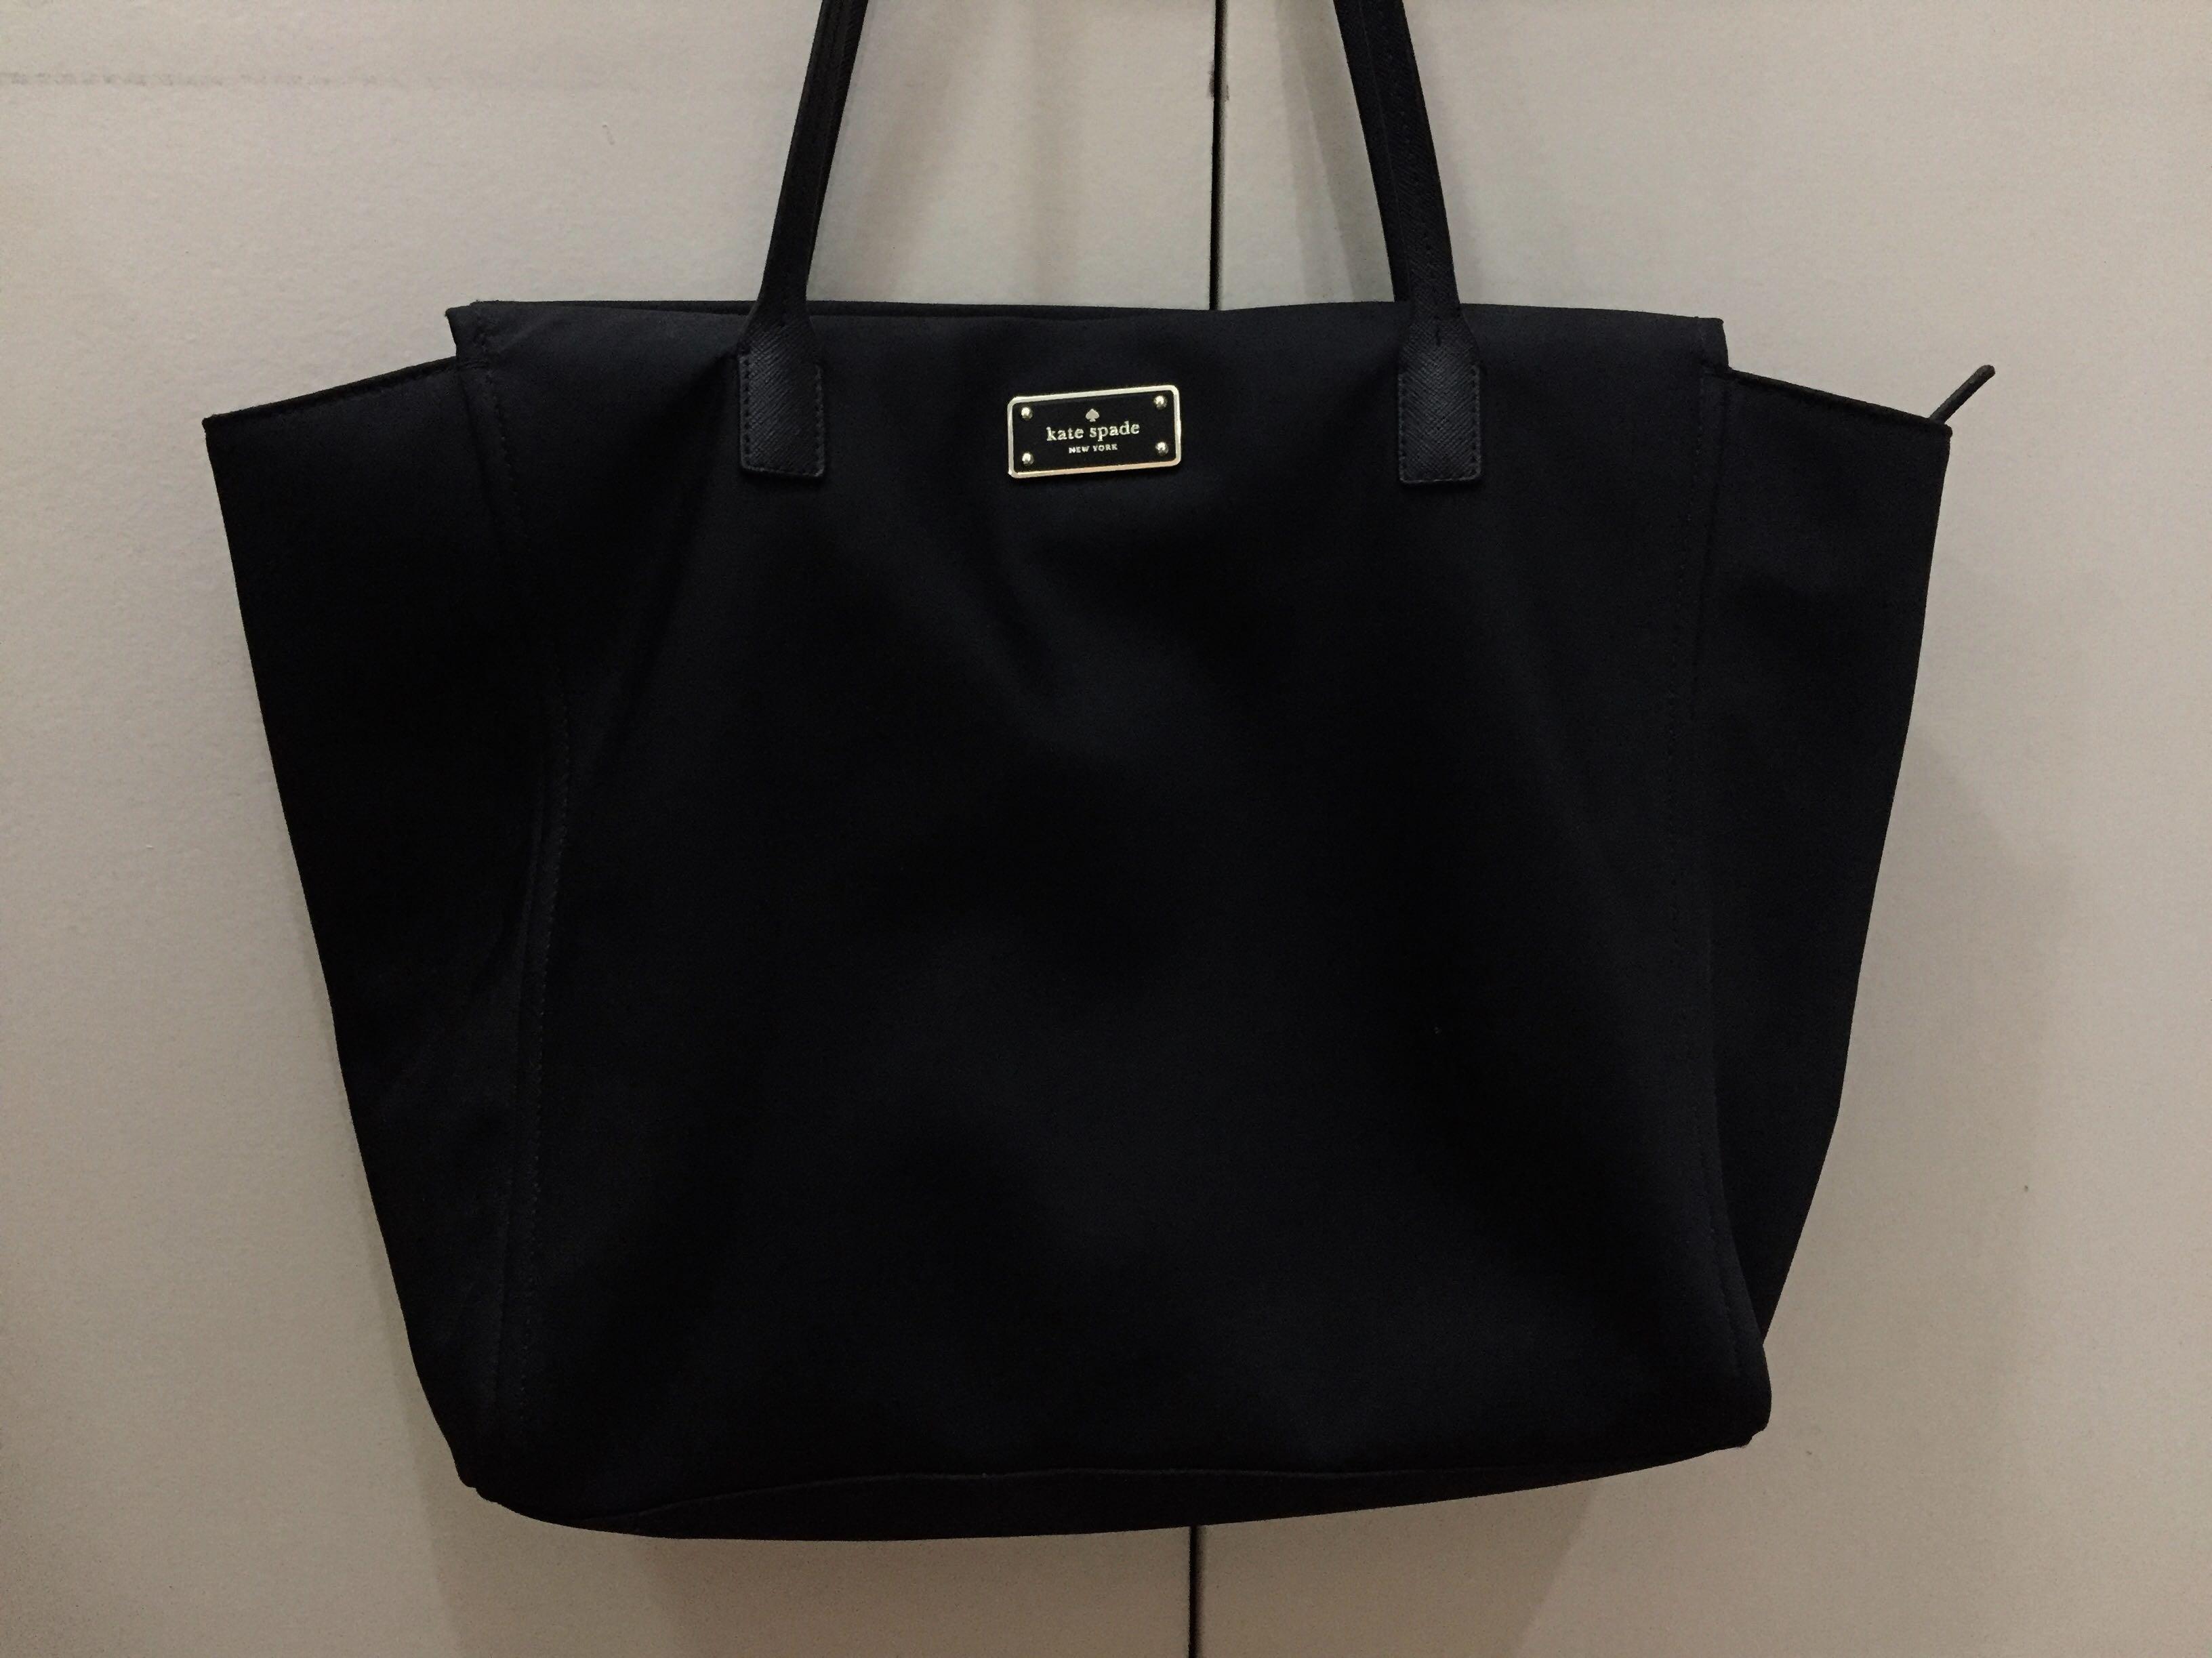 Kate Spade Nylon Black Shoulder Bag Tote Gold Hardware Women S Fashion Bags Wallets On Carou